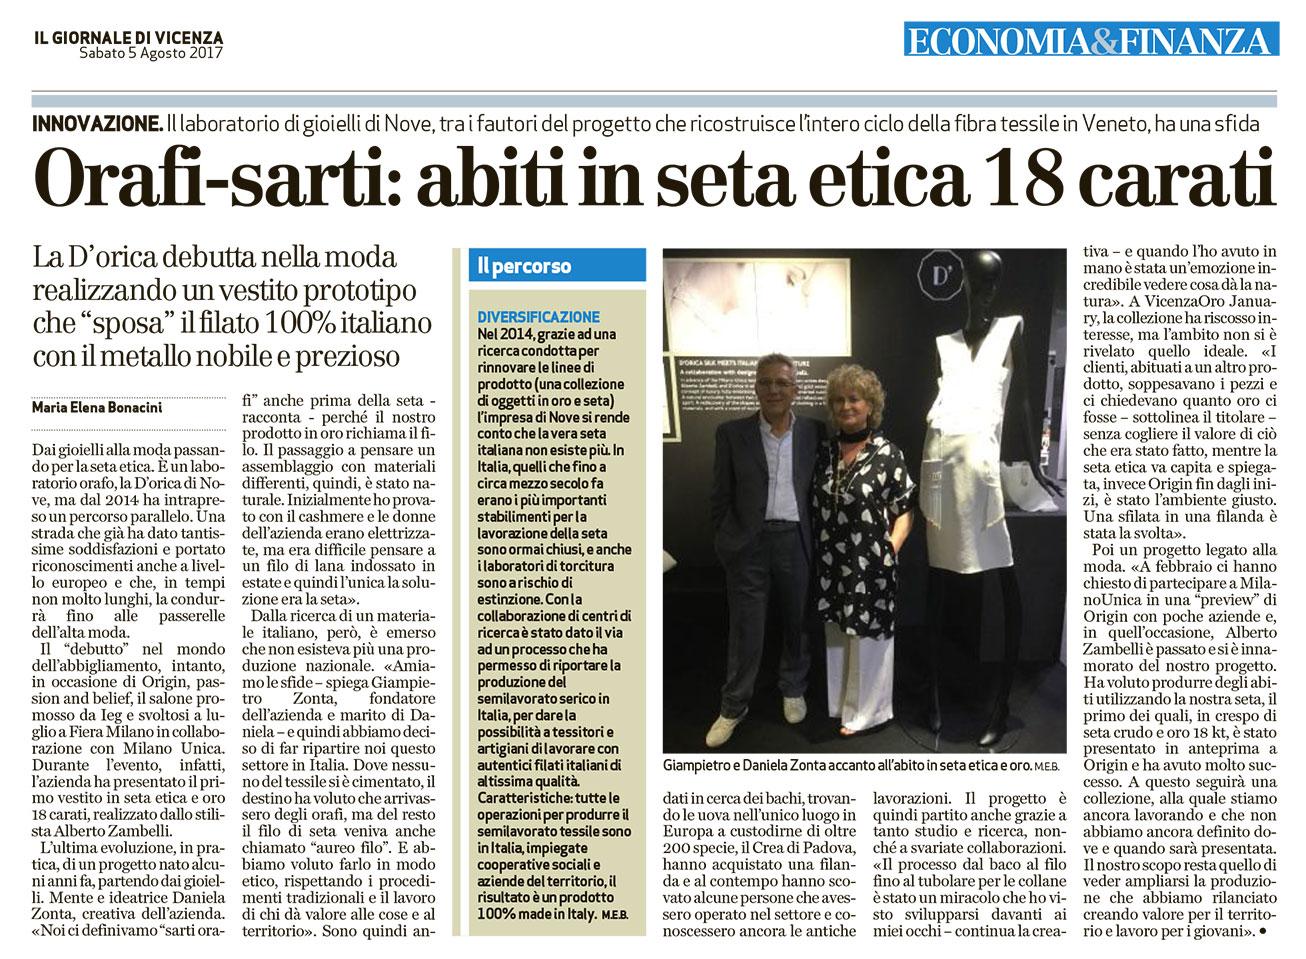 2017_08_05_Gdv_sarti_orafi